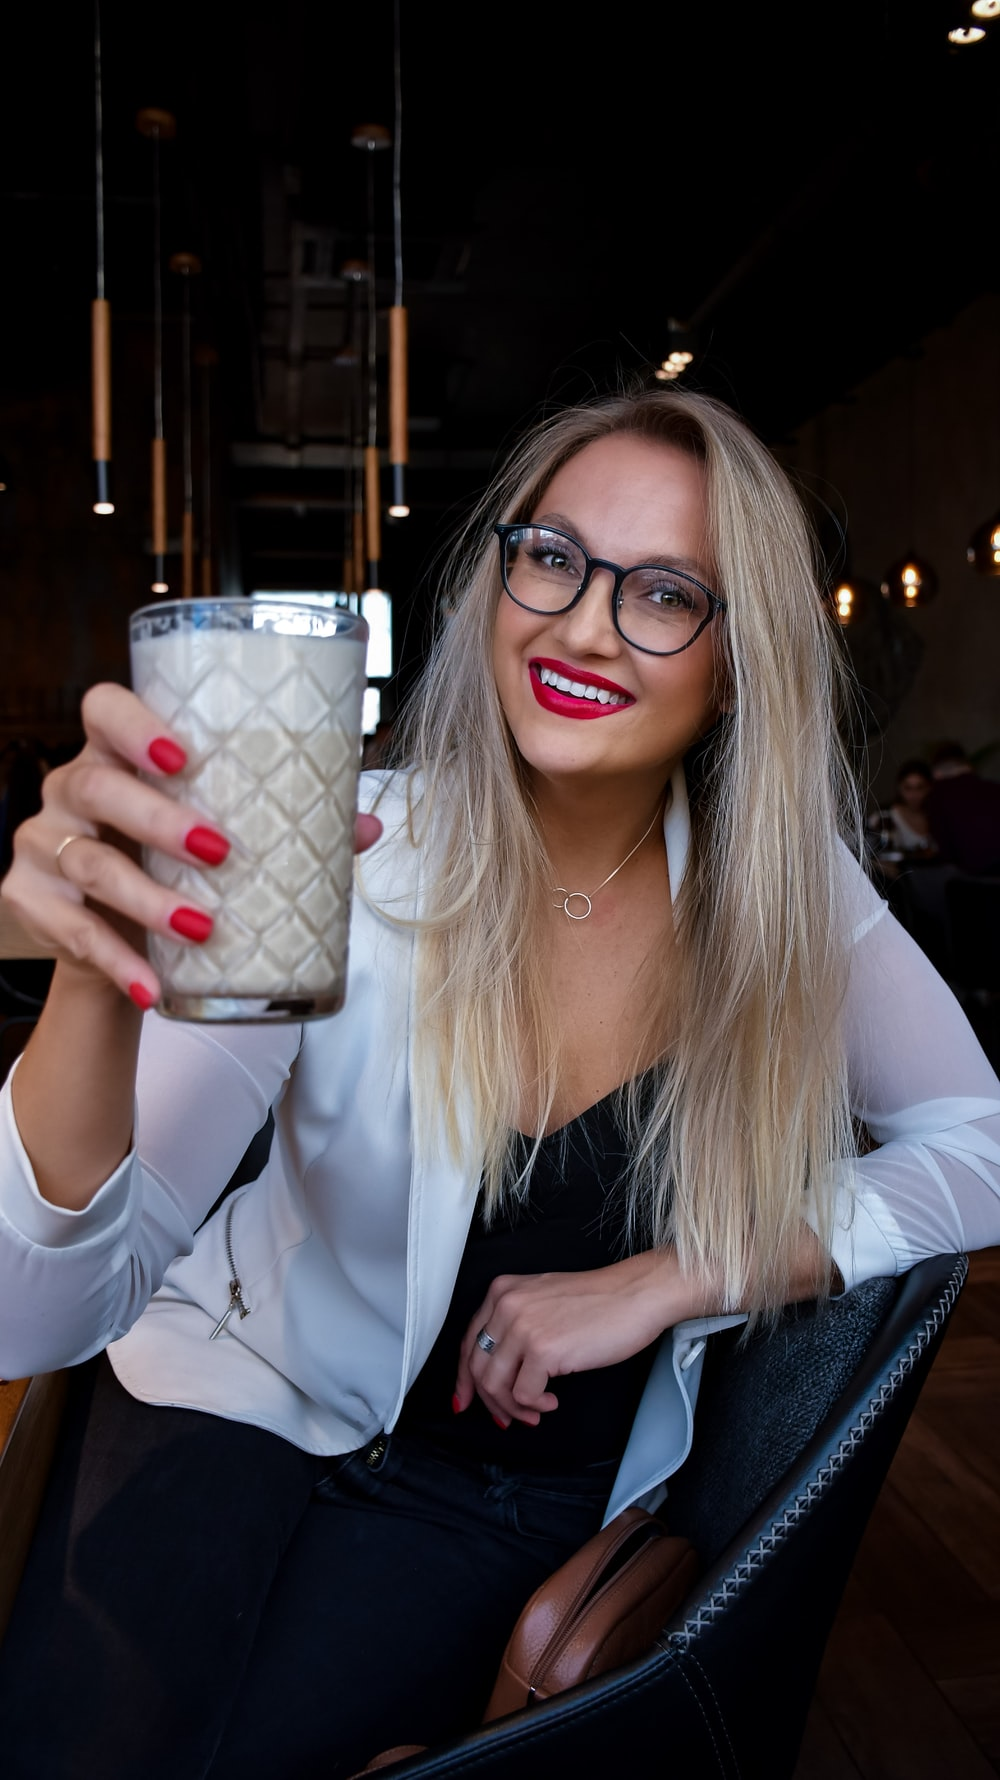 woman in white blazer holding white and red ceramic mug